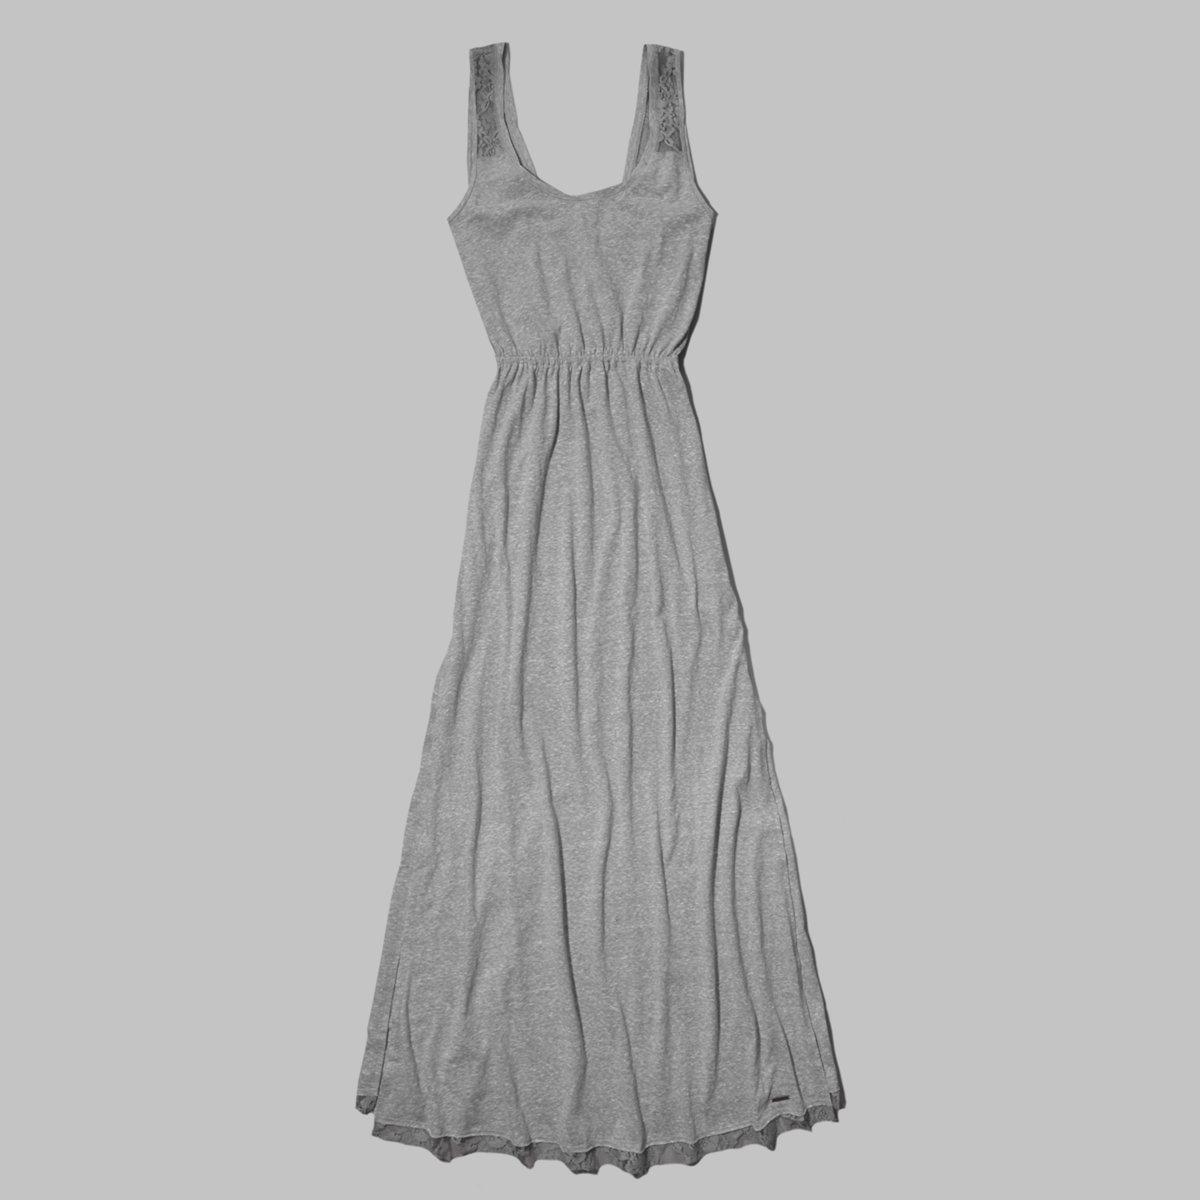 Meredith Knit Maxi Dress